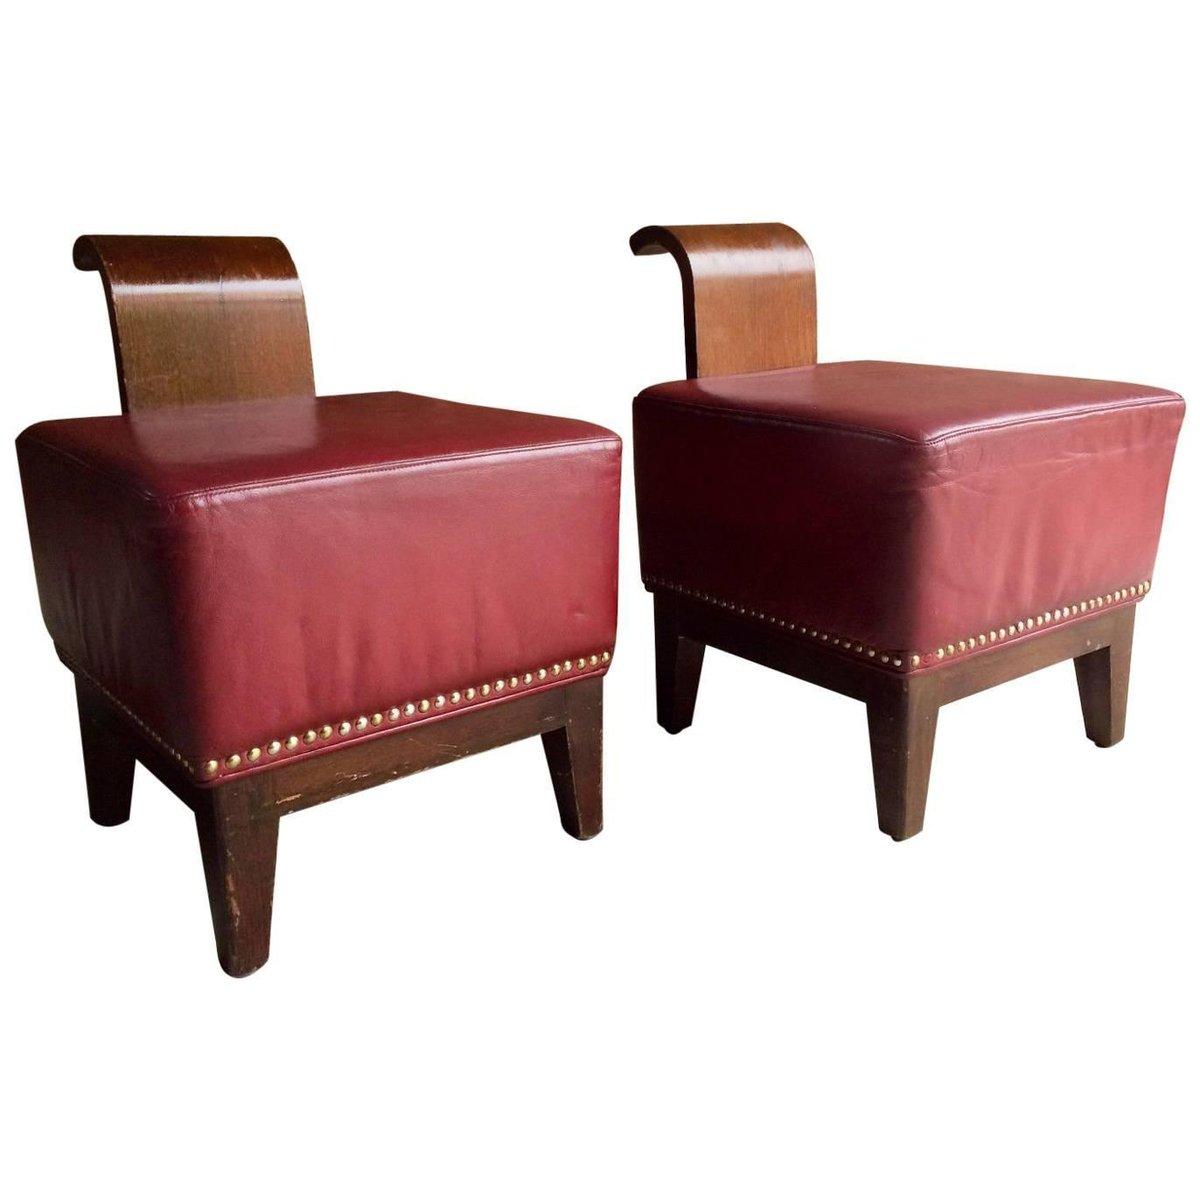 Französische Art Deco Cocktail Sessel, 2er Set